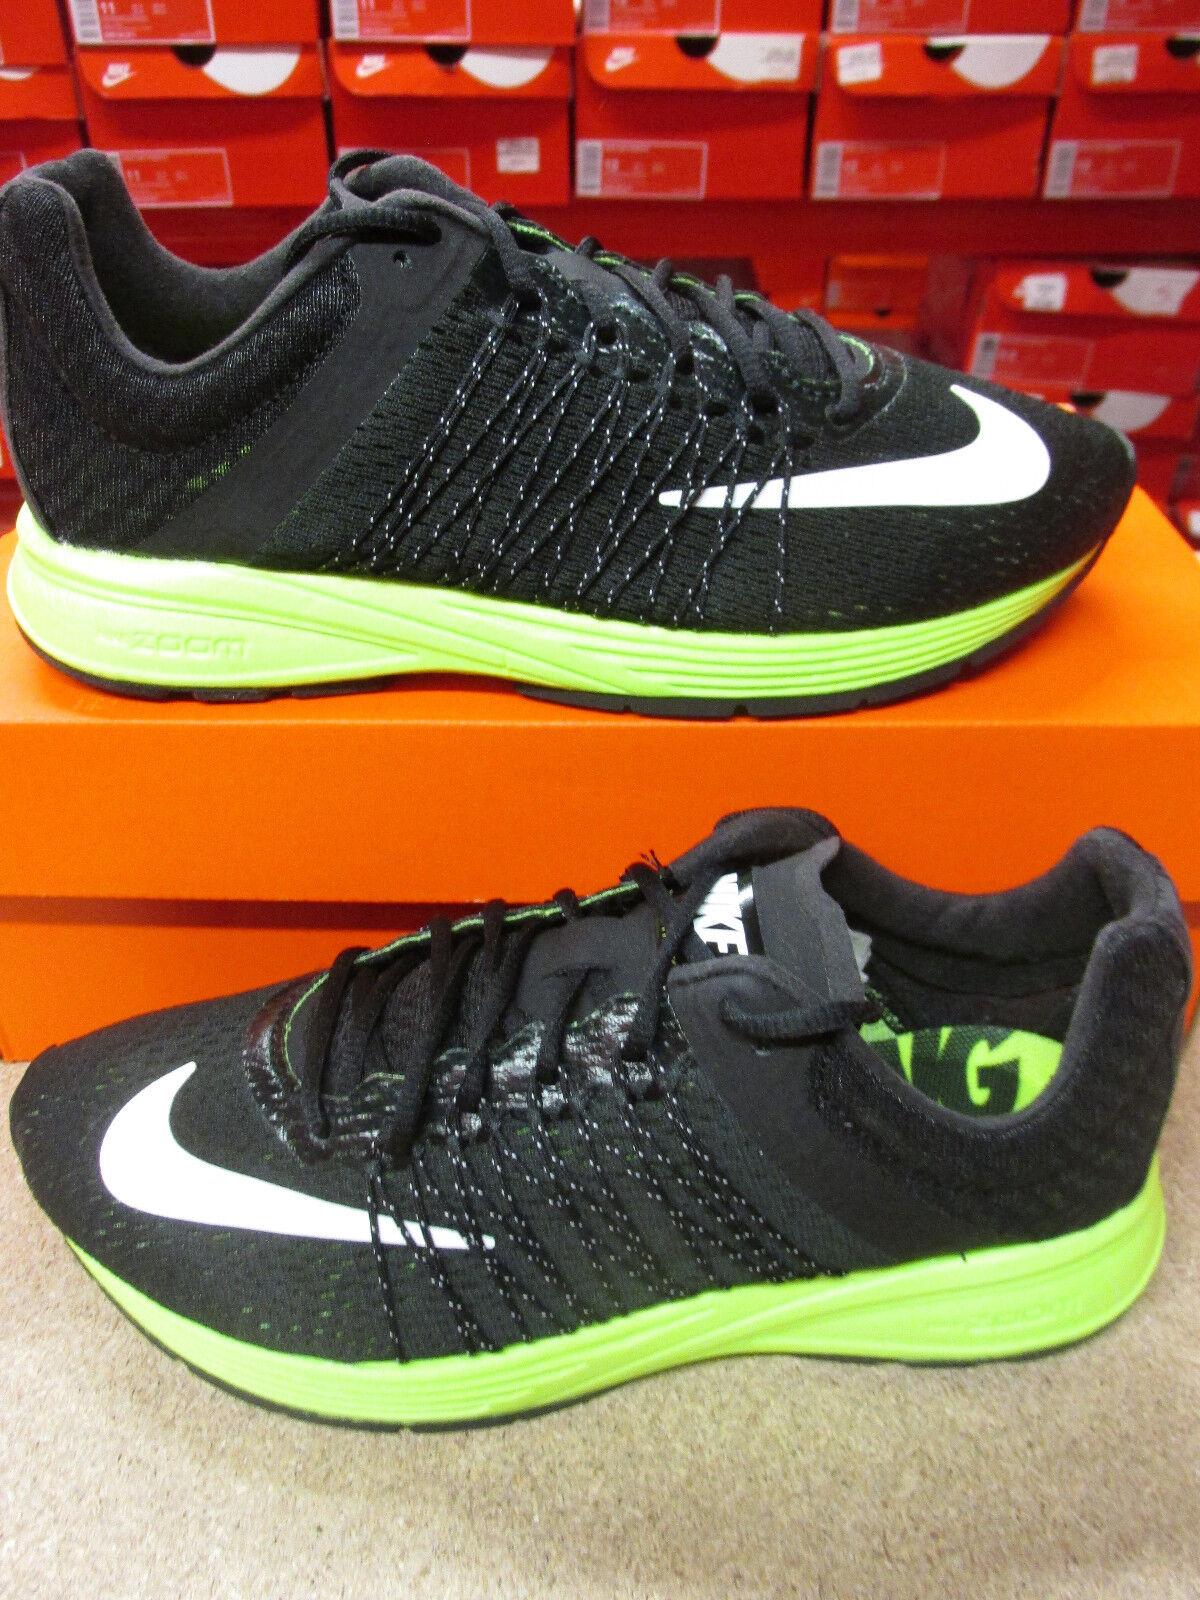 de097d40e942 Nike Air Zoom Streak Streak Streak 3 Mens Running Trainers 641318 007  Sneakers Shoes 1317b5